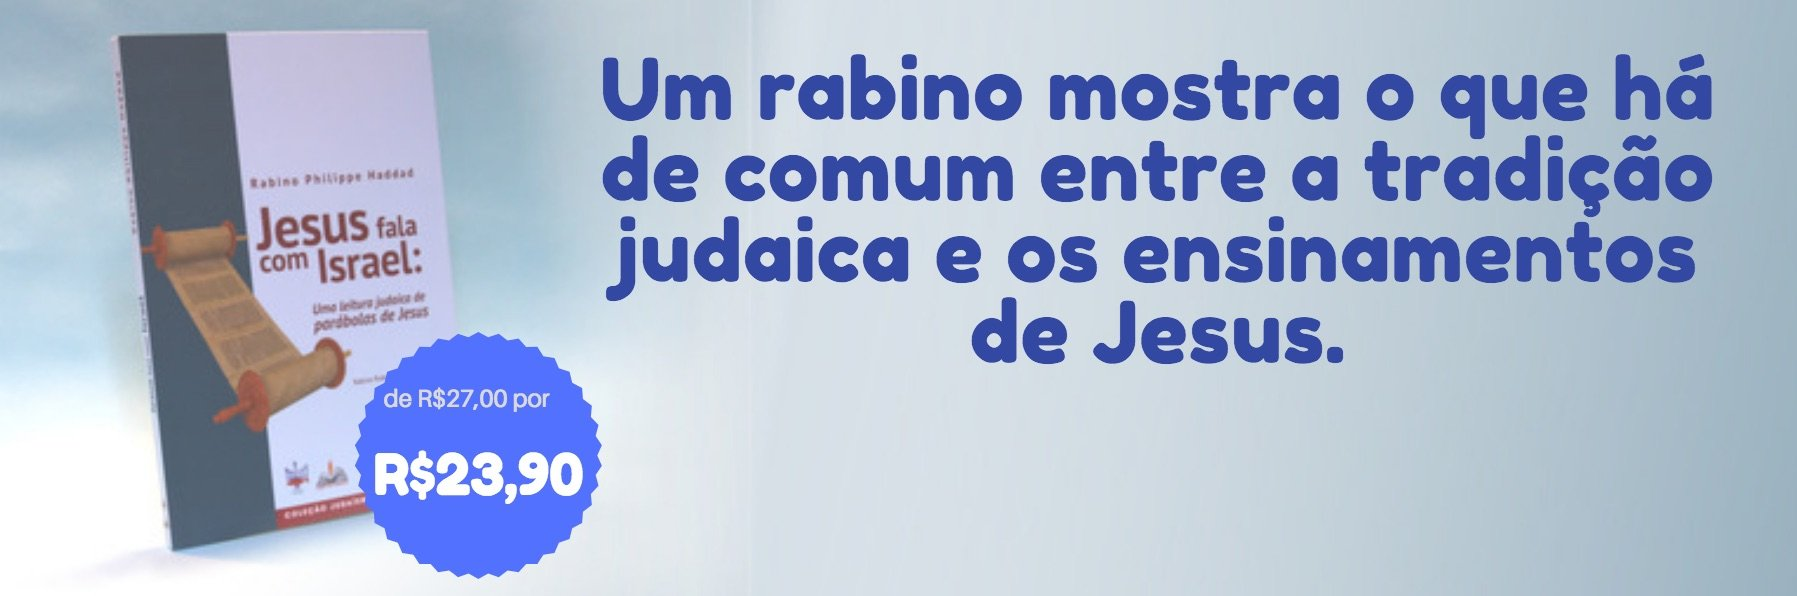 Jesus fala com israel